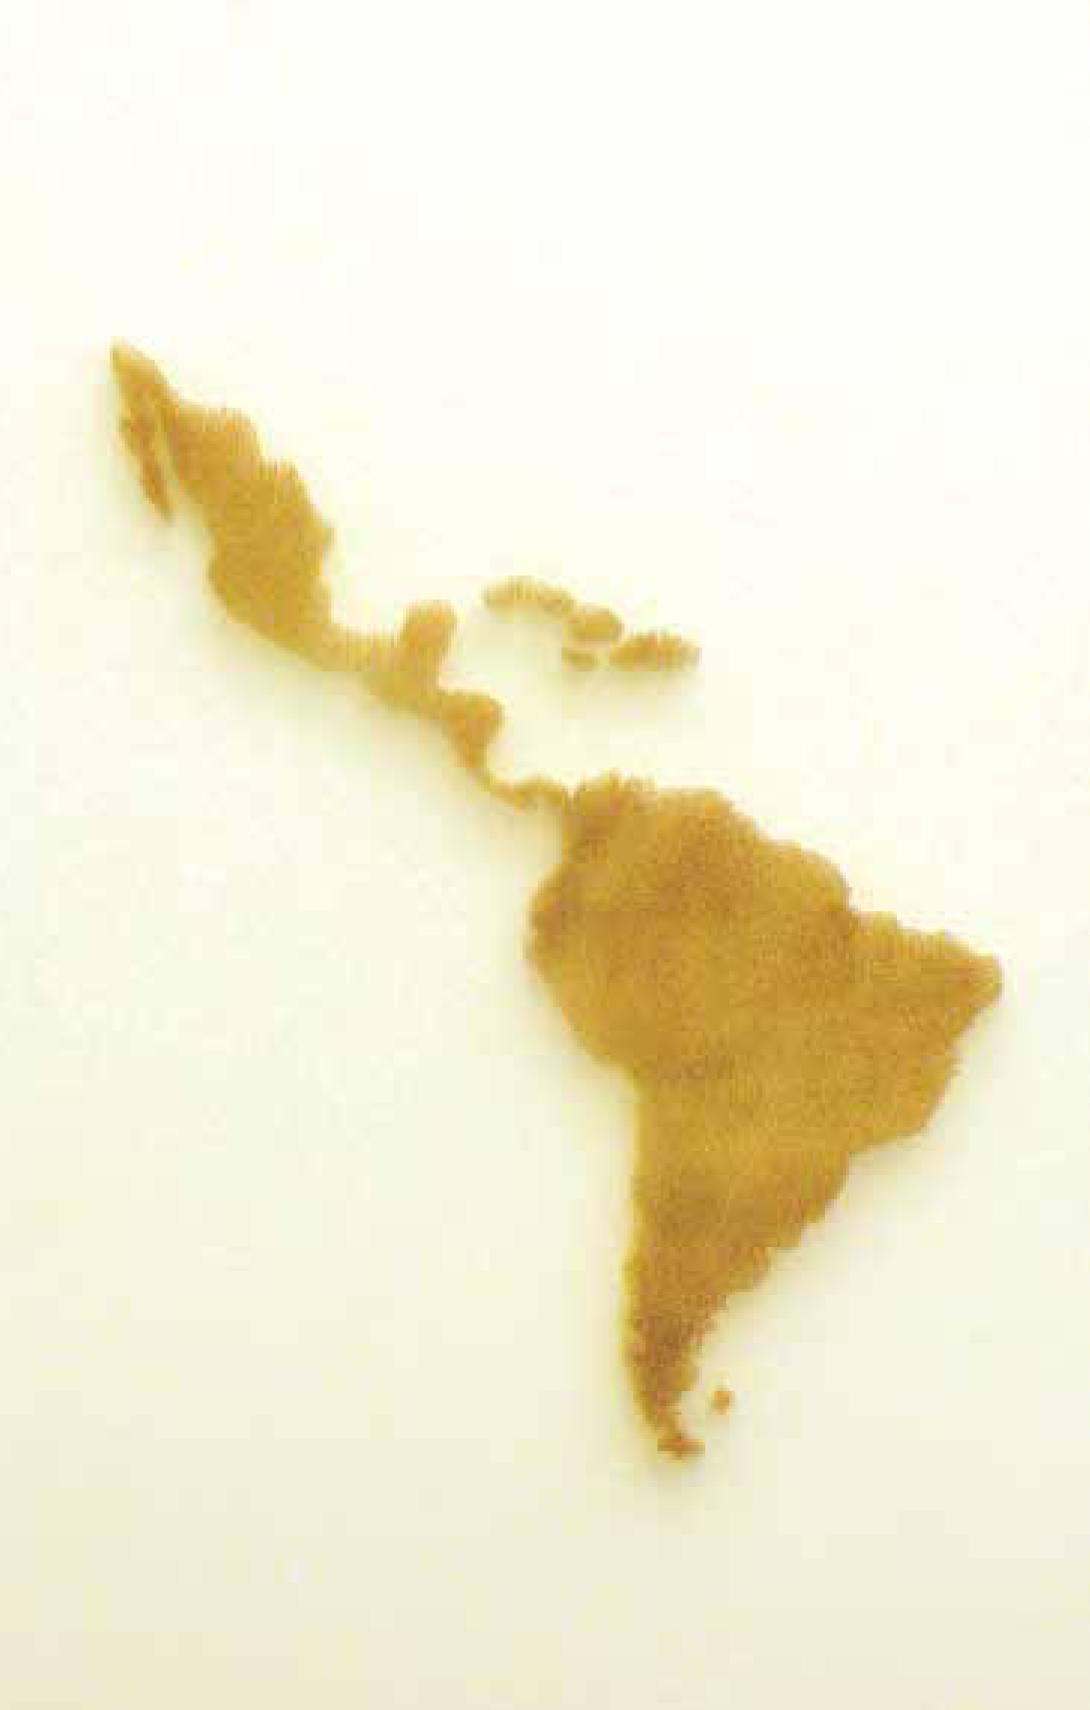 Lester Rodríguez // Honduras // Cartografía // Madera perforada, palillos de dientes